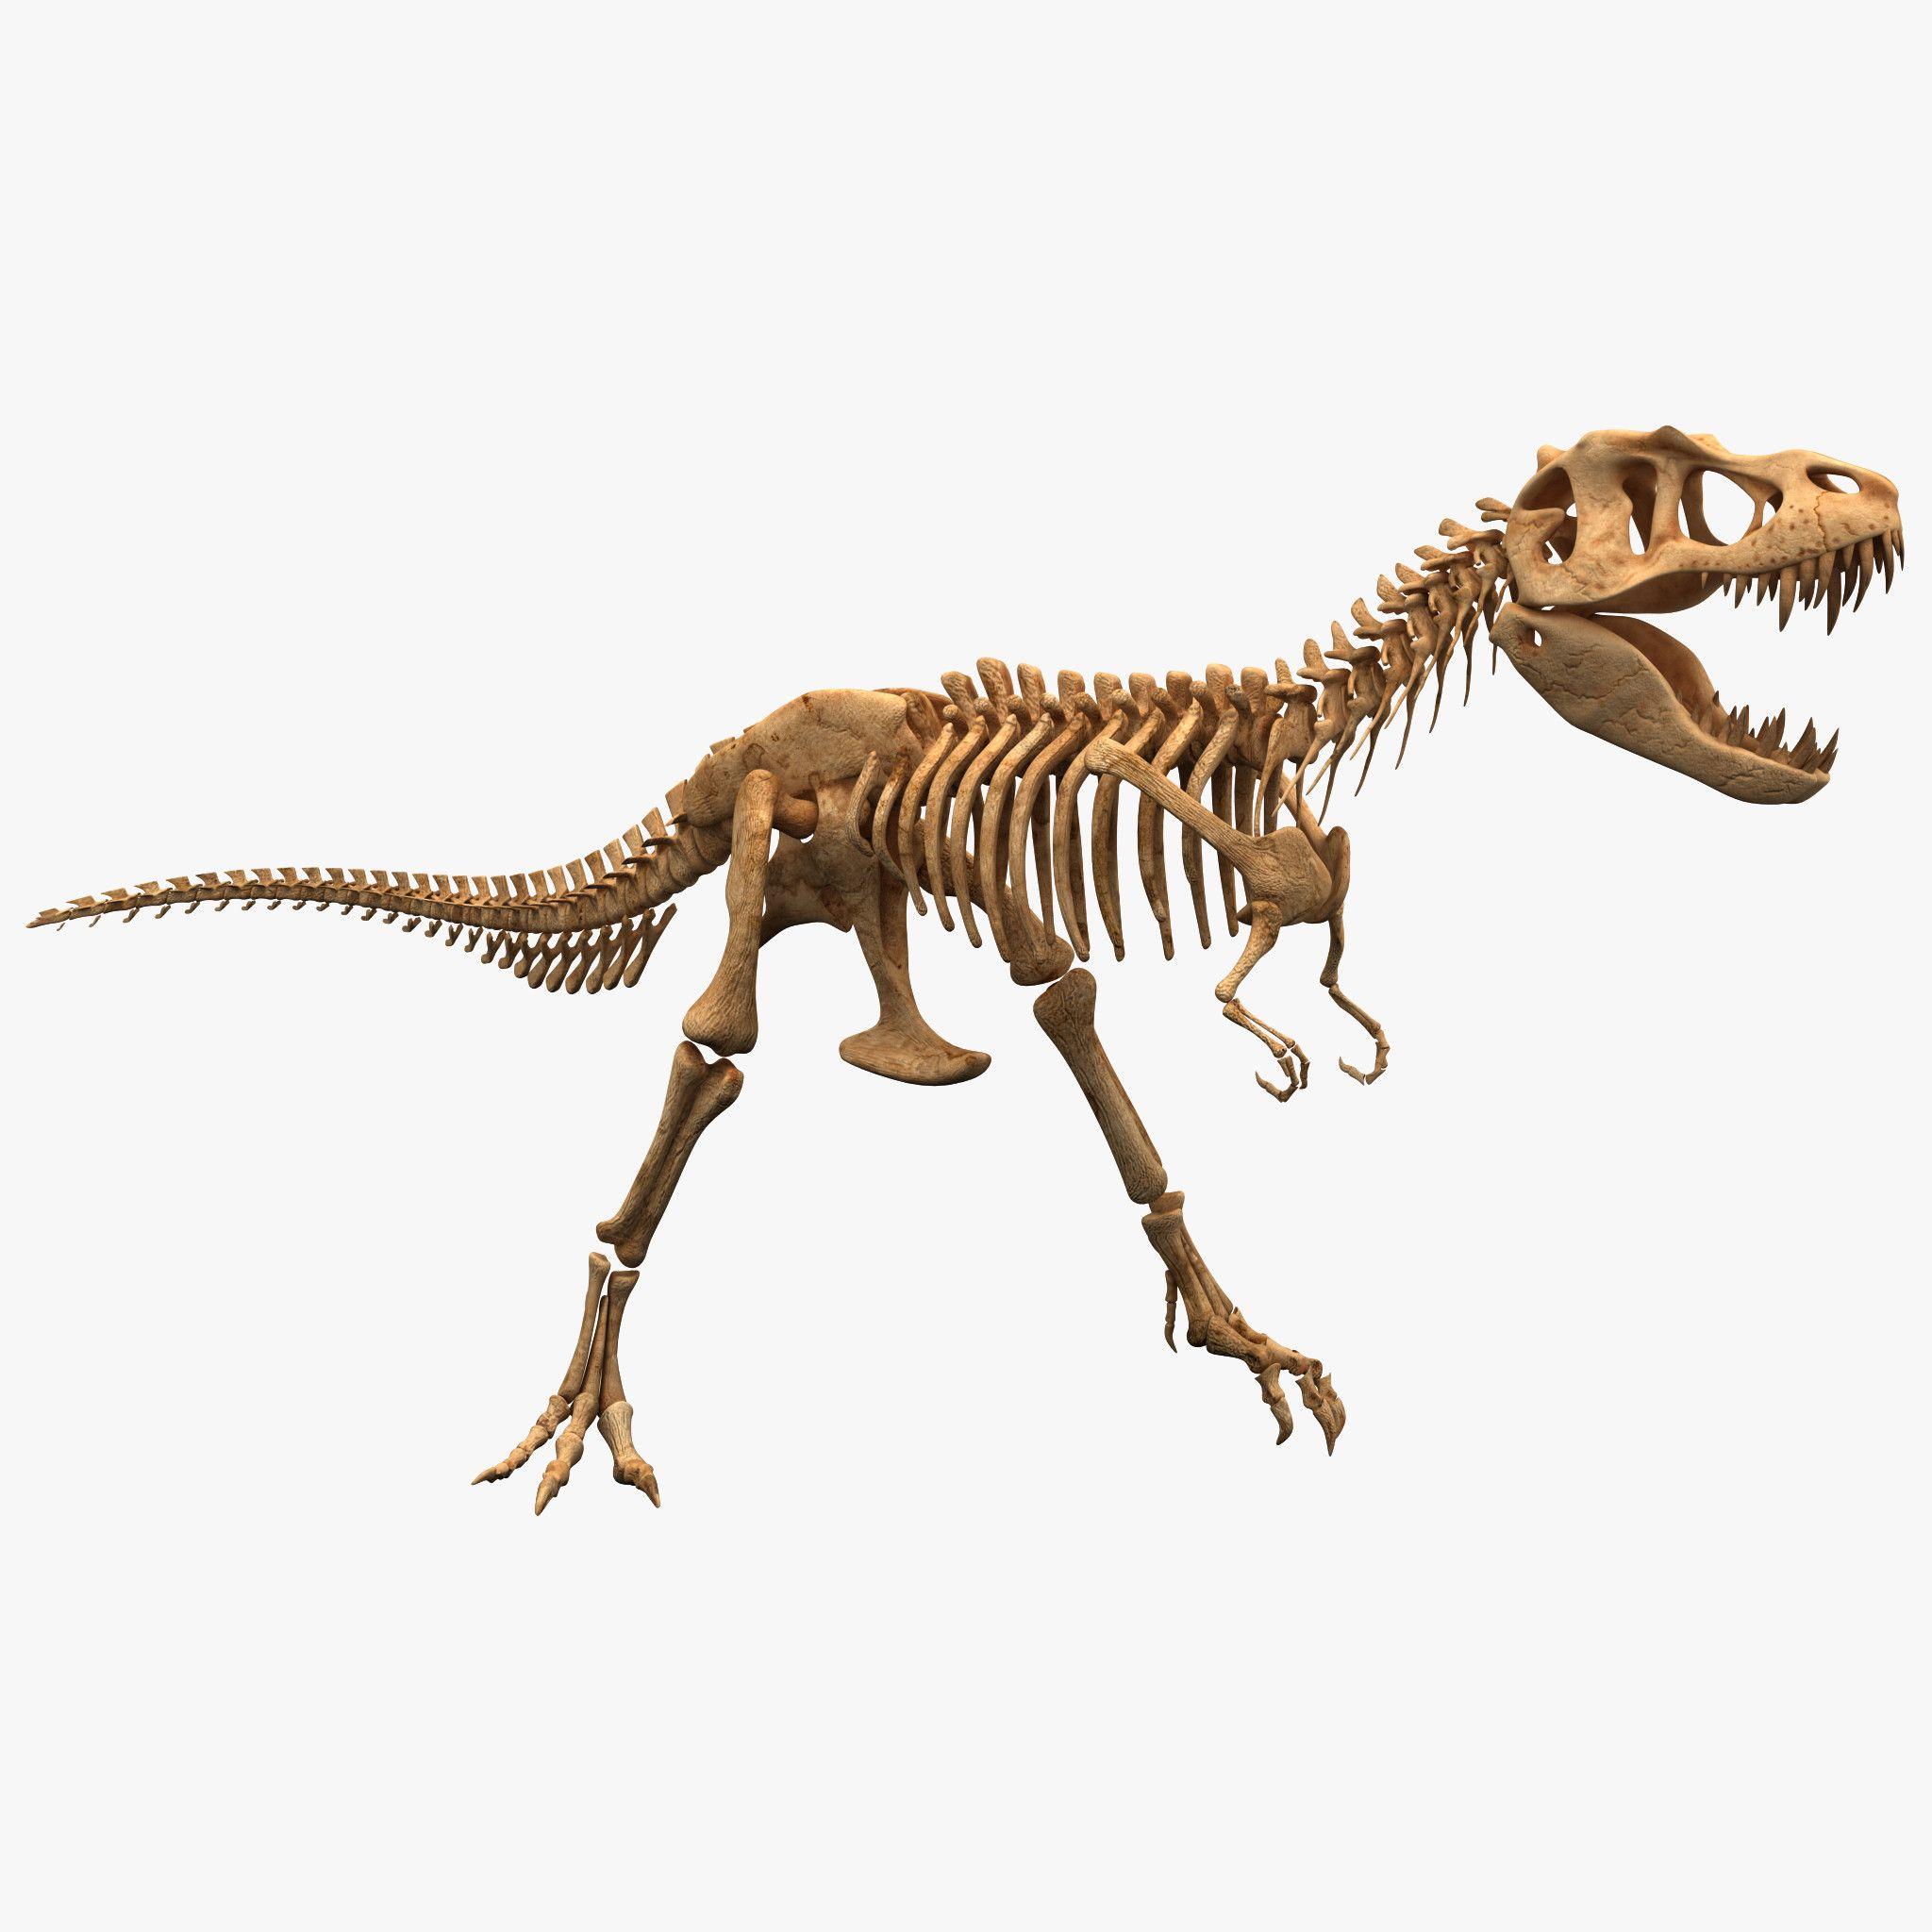 Картинки скелетов динозавров с названиями